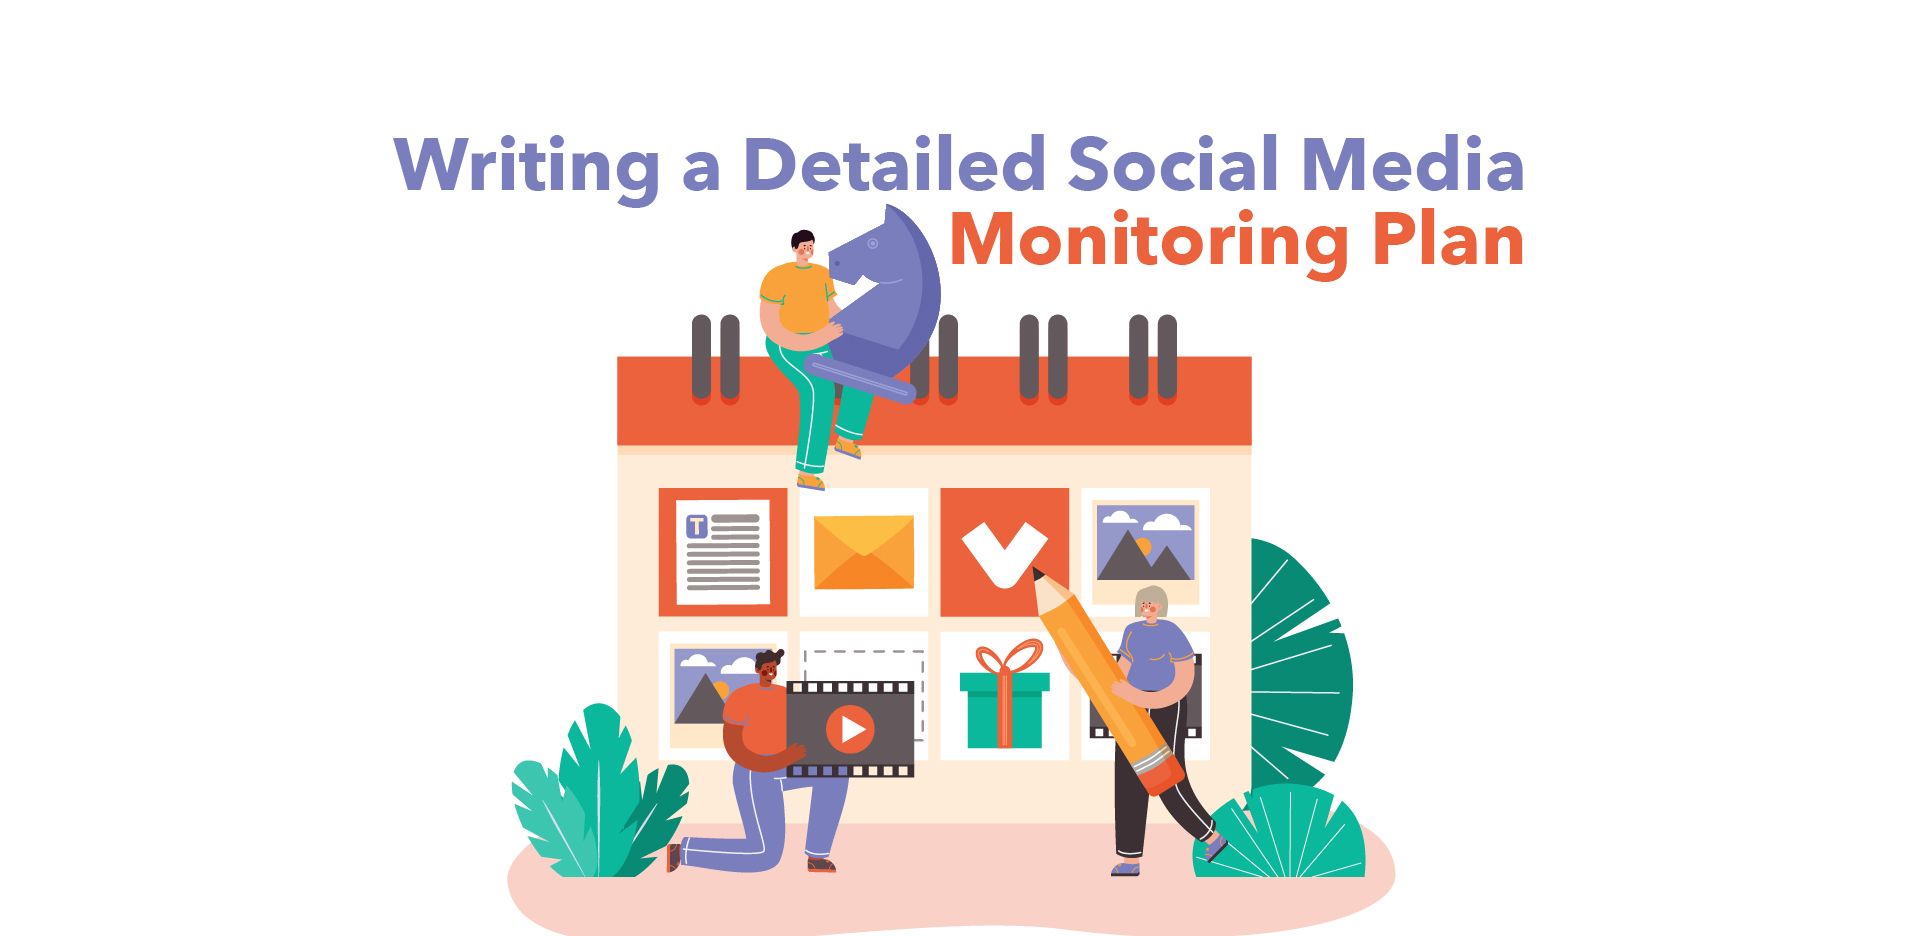 Tutorial for Writing Detailed Social Media Monitoring Plan